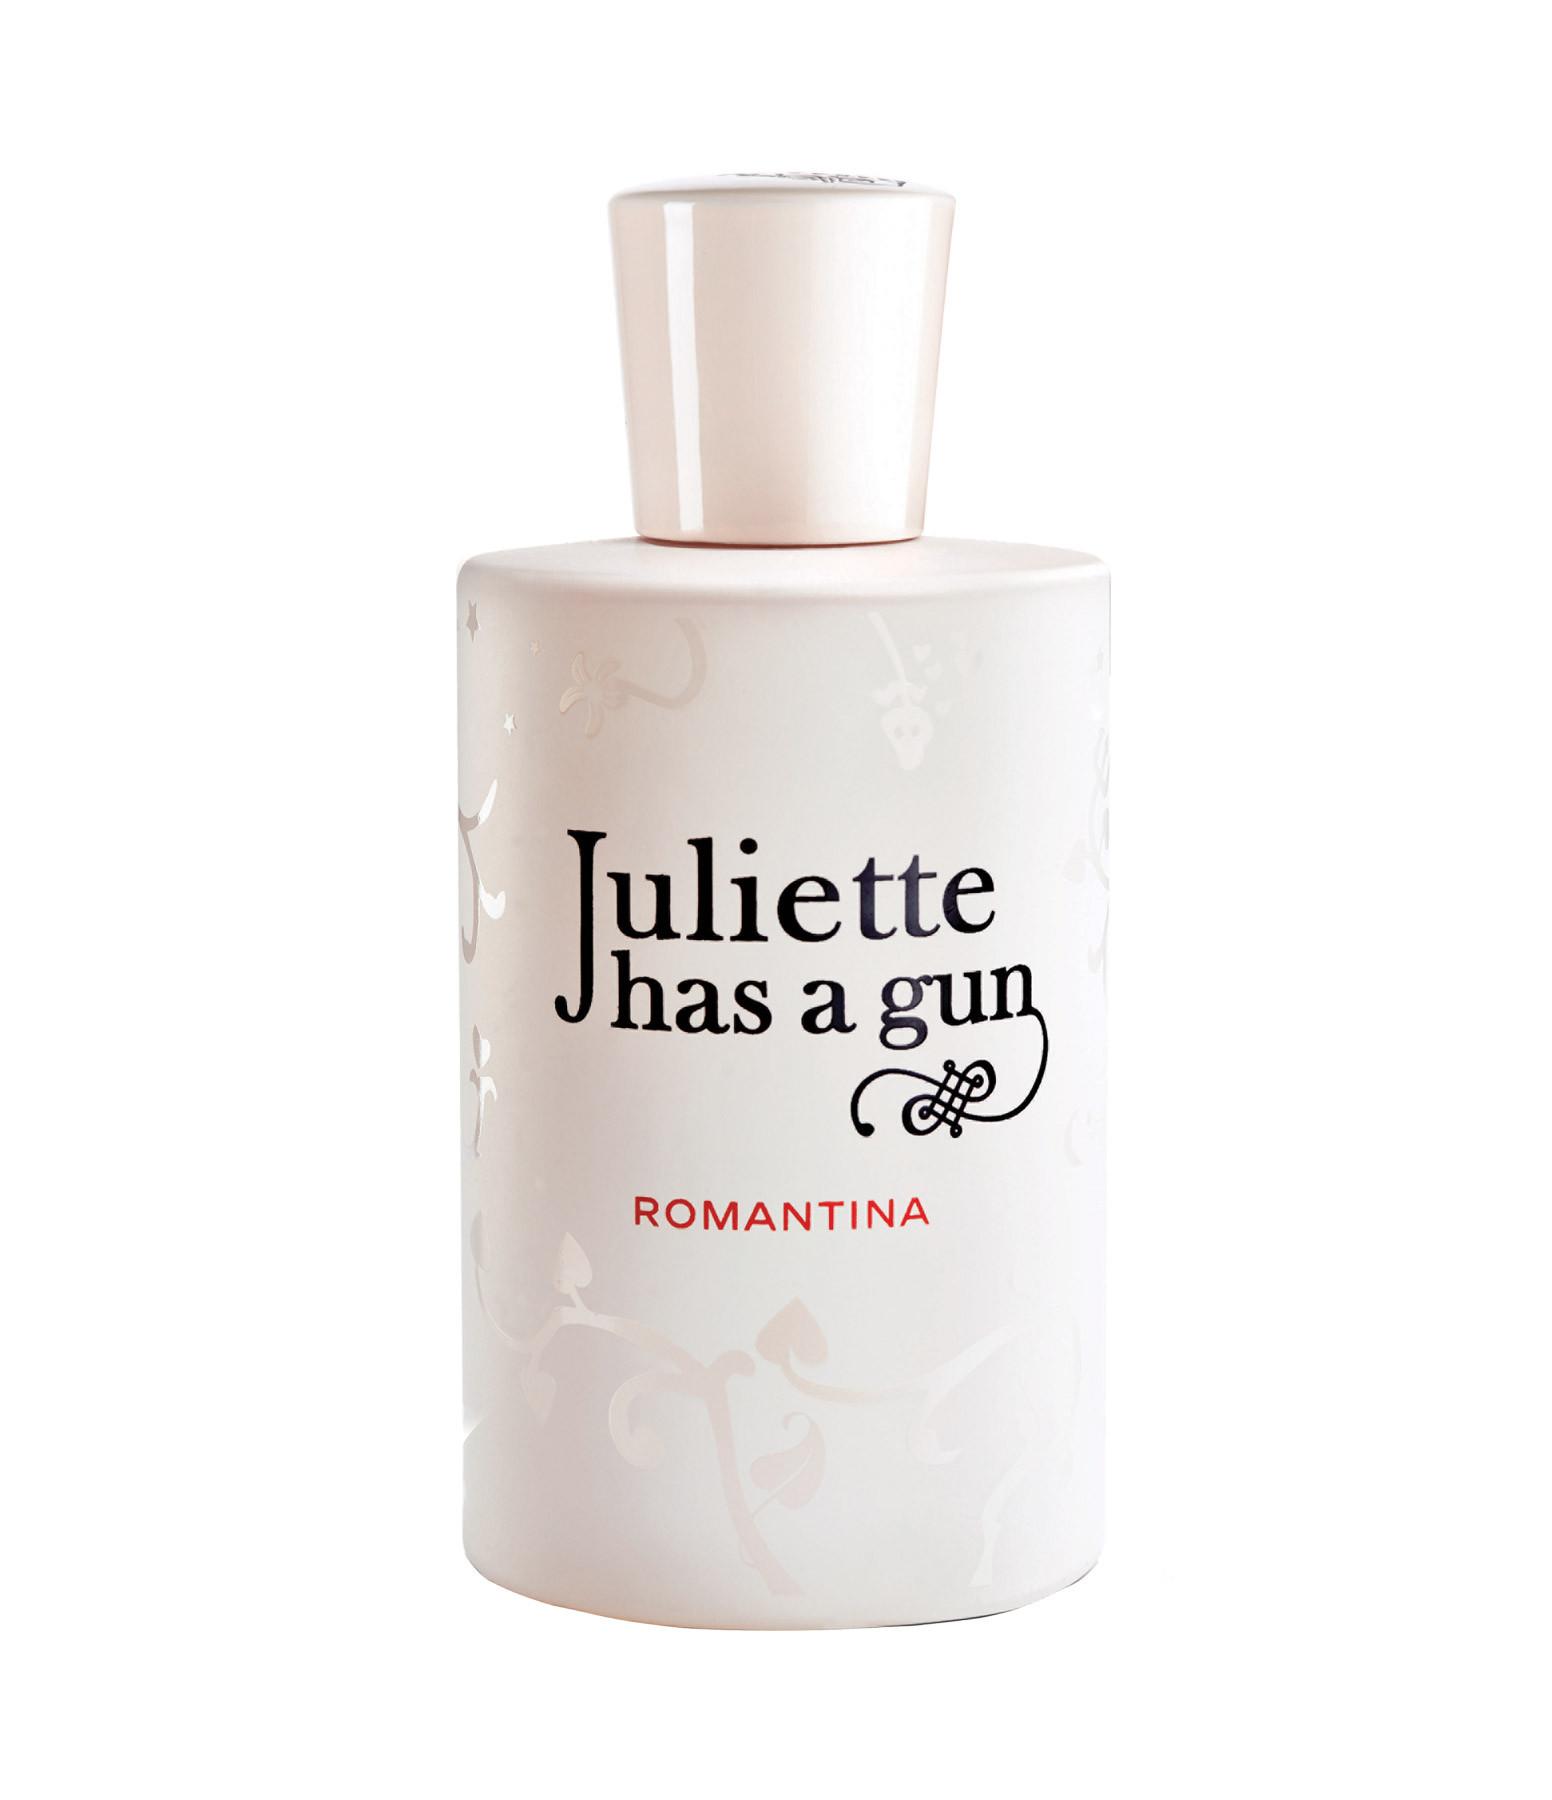 JULIETTE HAS A GUN - Eau de Parfum Romantina 100 ml